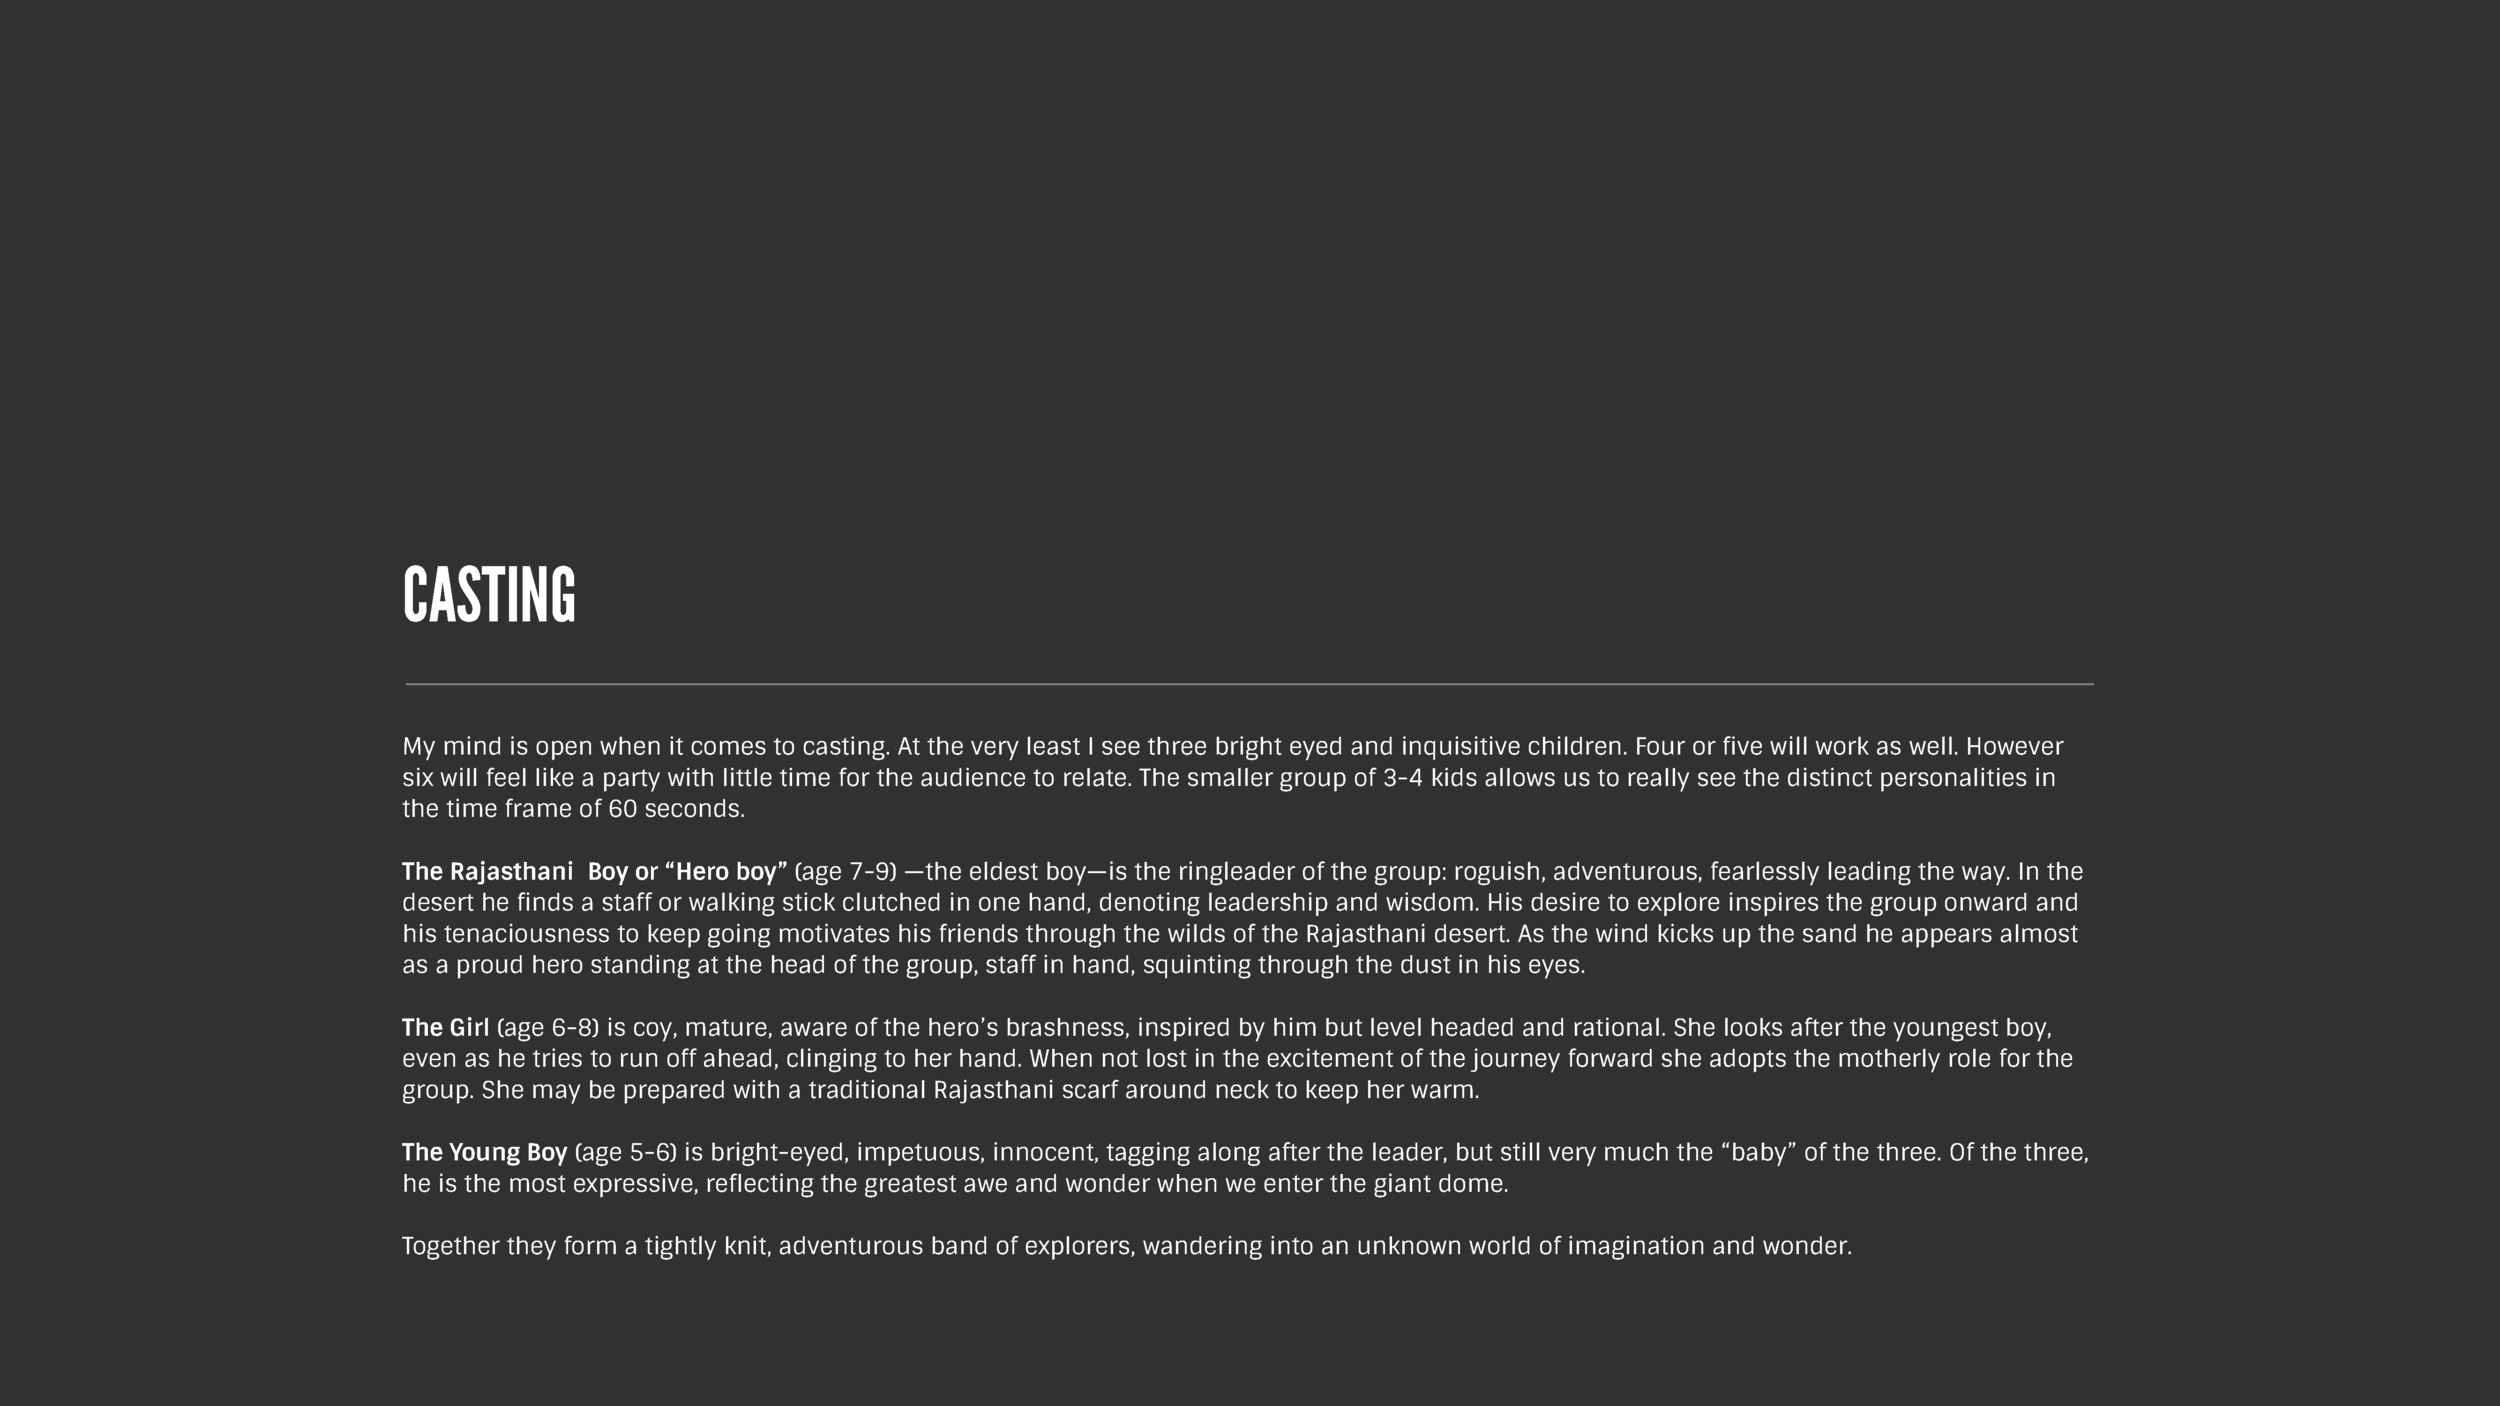 Samsung-Chiel-Kissfilms-Treatment-v8_Page_26.png